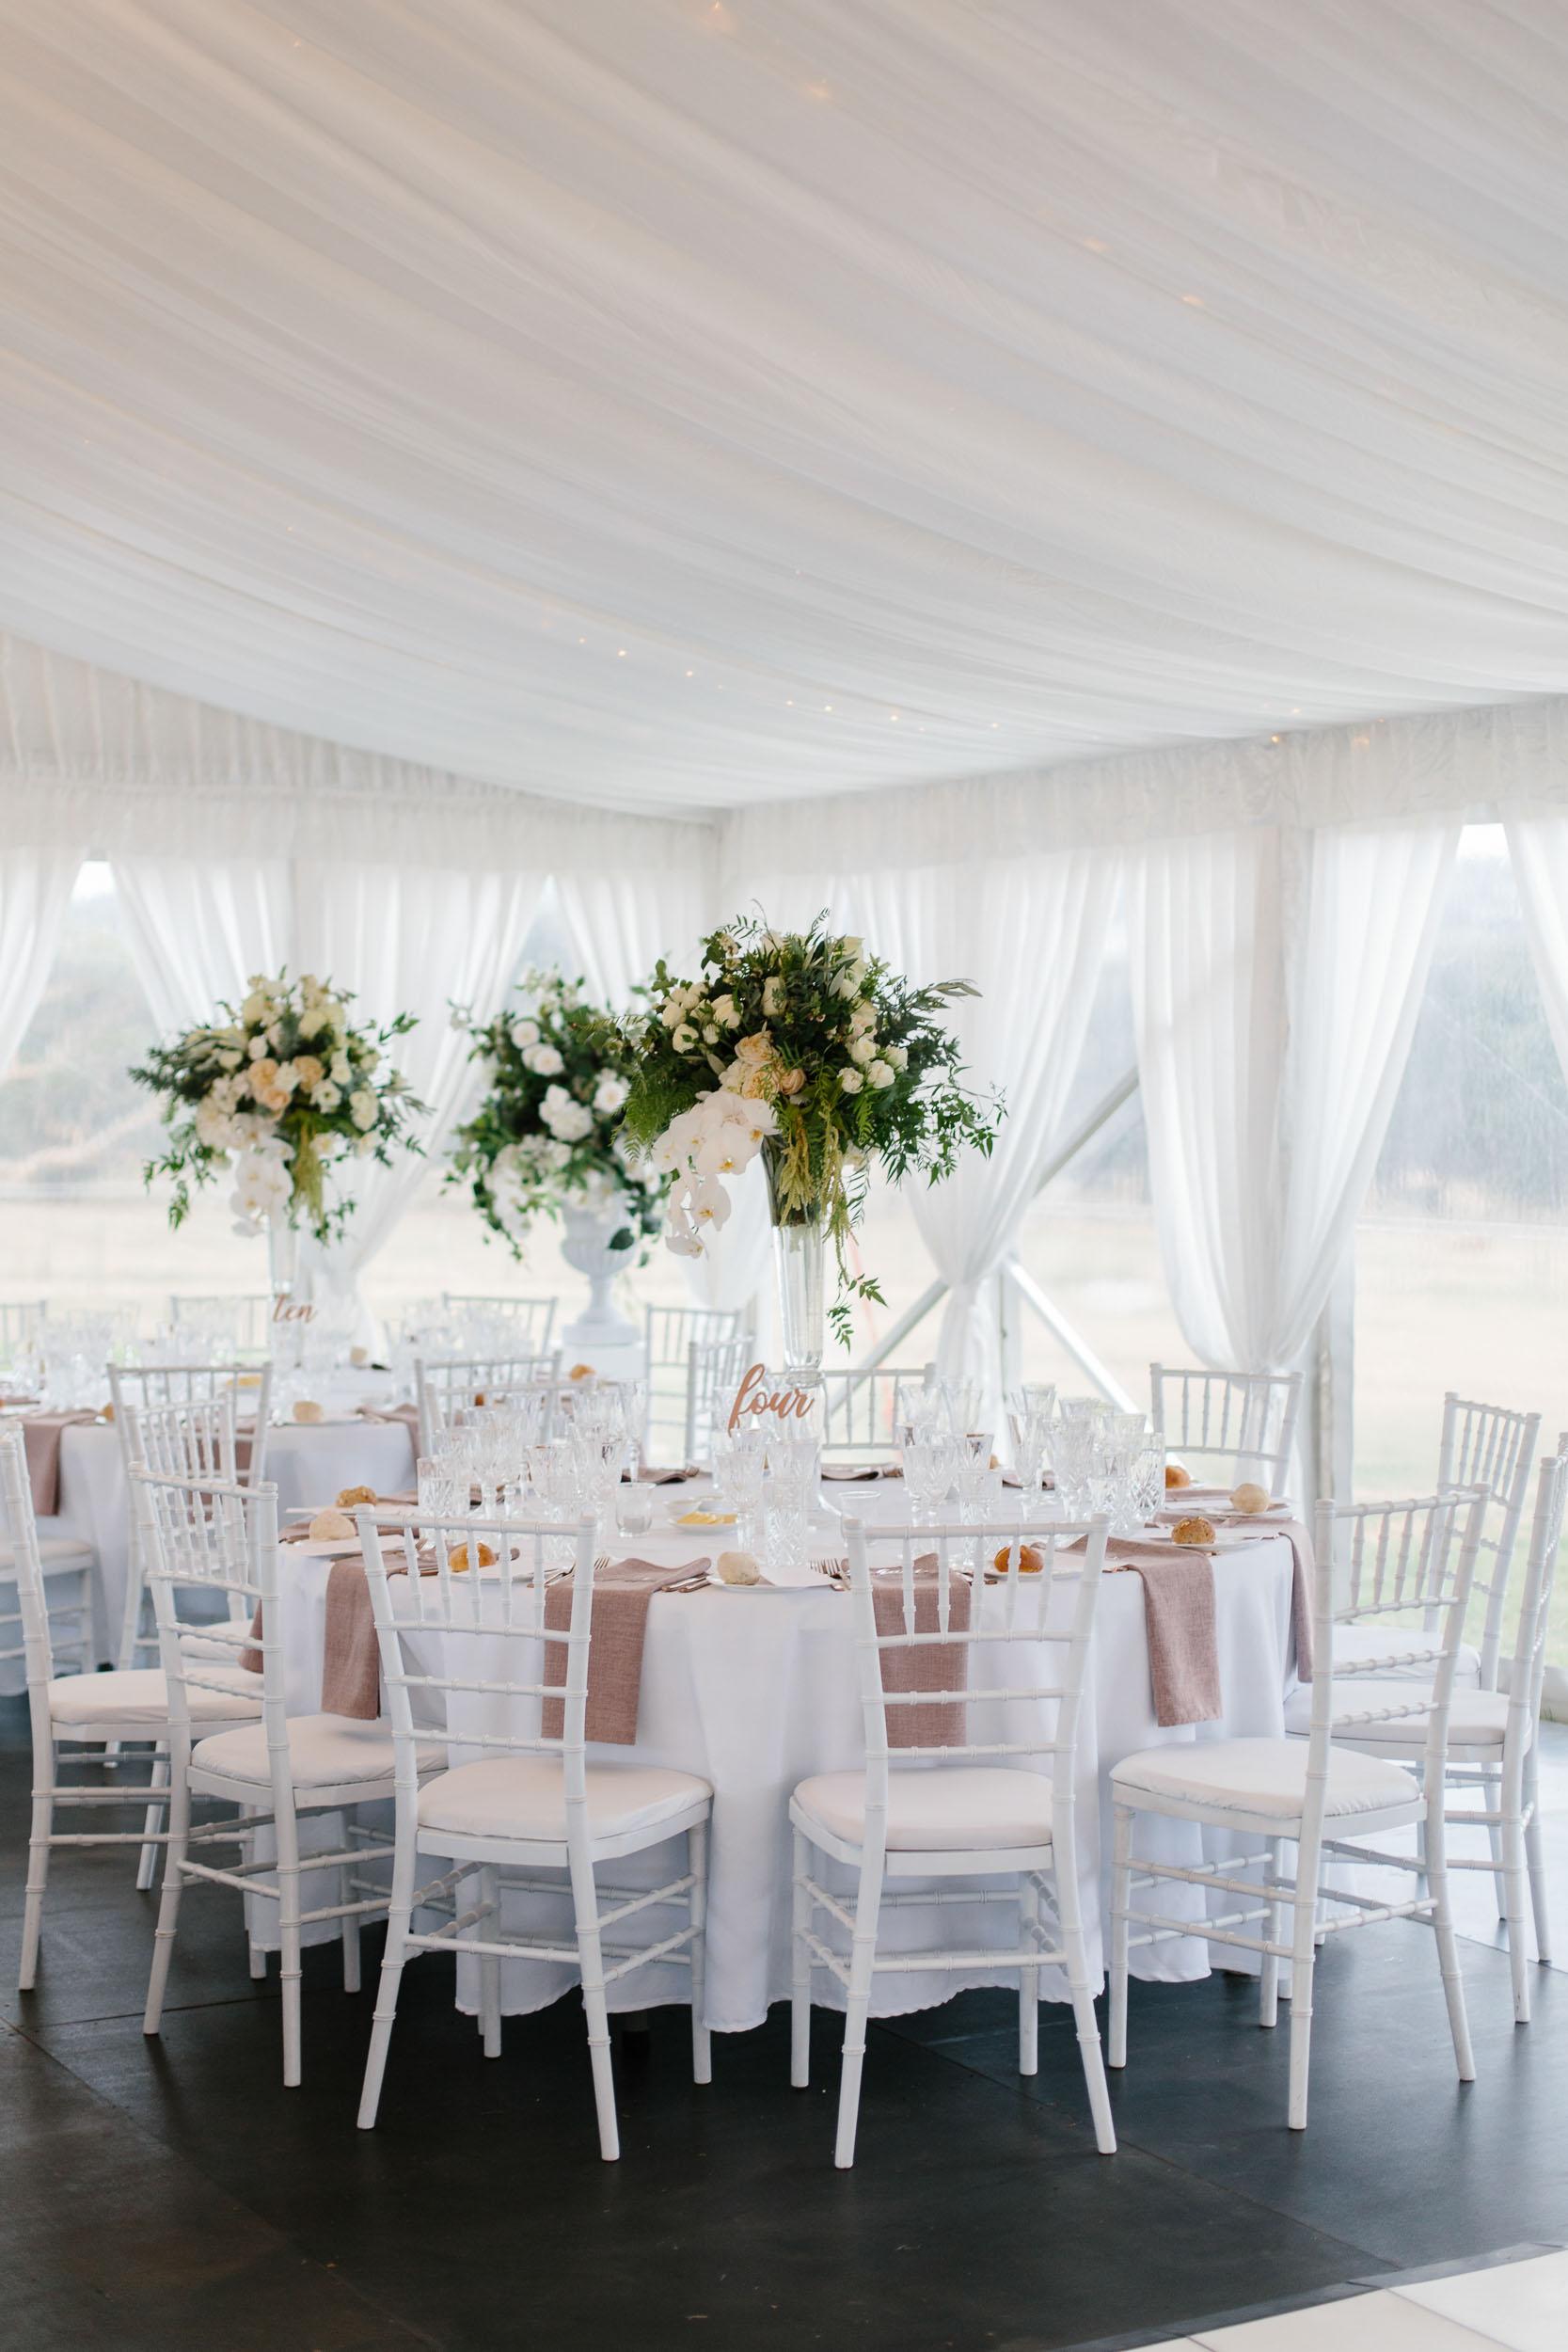 Kas-Richards-Mornington-Peninsula-Private-Property-Wedding-Marianna-Hardwick-Gown-527.jpg